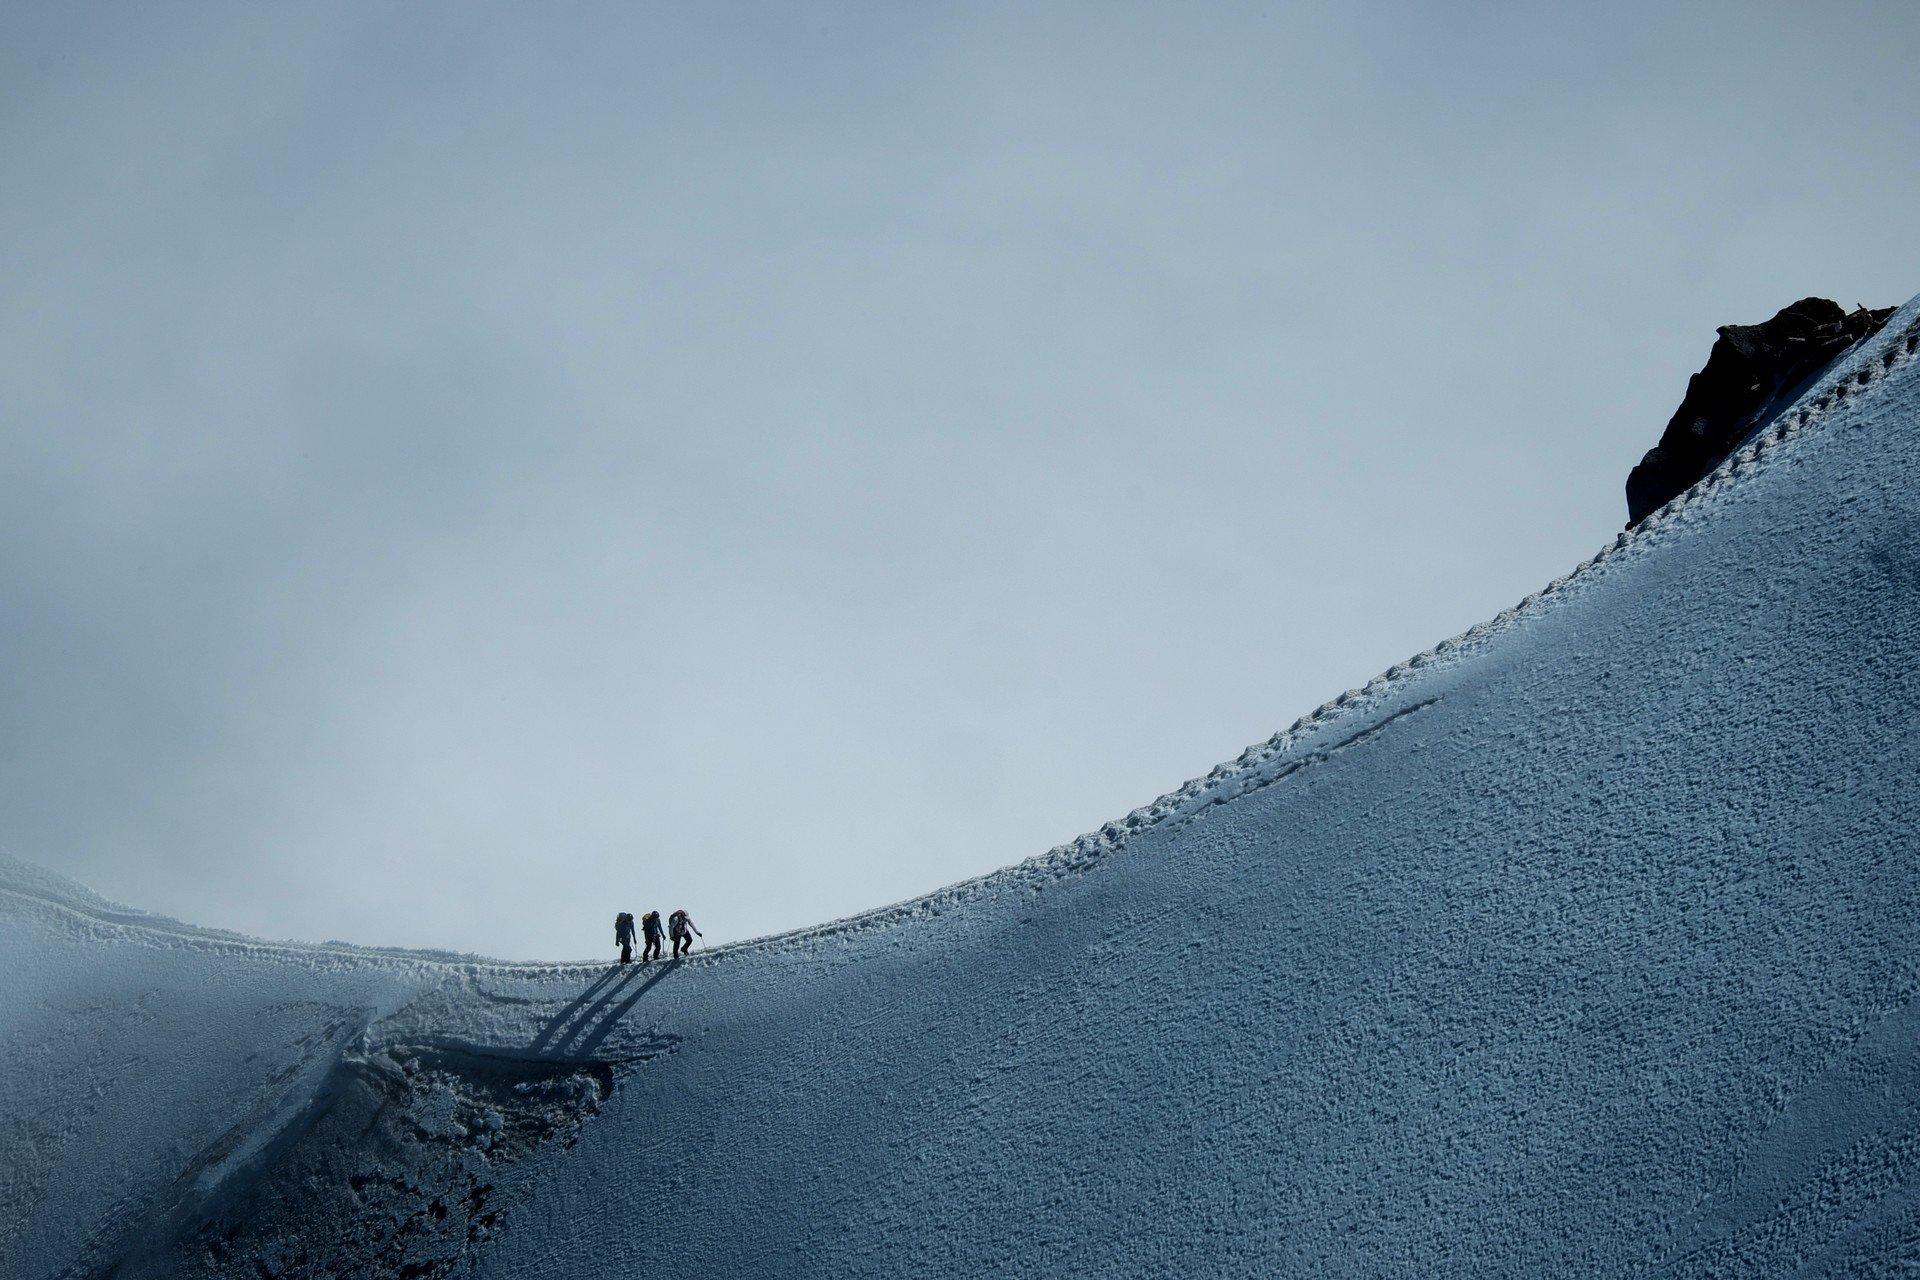 Горы, Альпы, Альпинизм, Монблан, путешествие, восхождение, mountains, mountaineering, alpinism, Alps, Mont Blanc, travel, ascend, Serg Pechenizhskiy